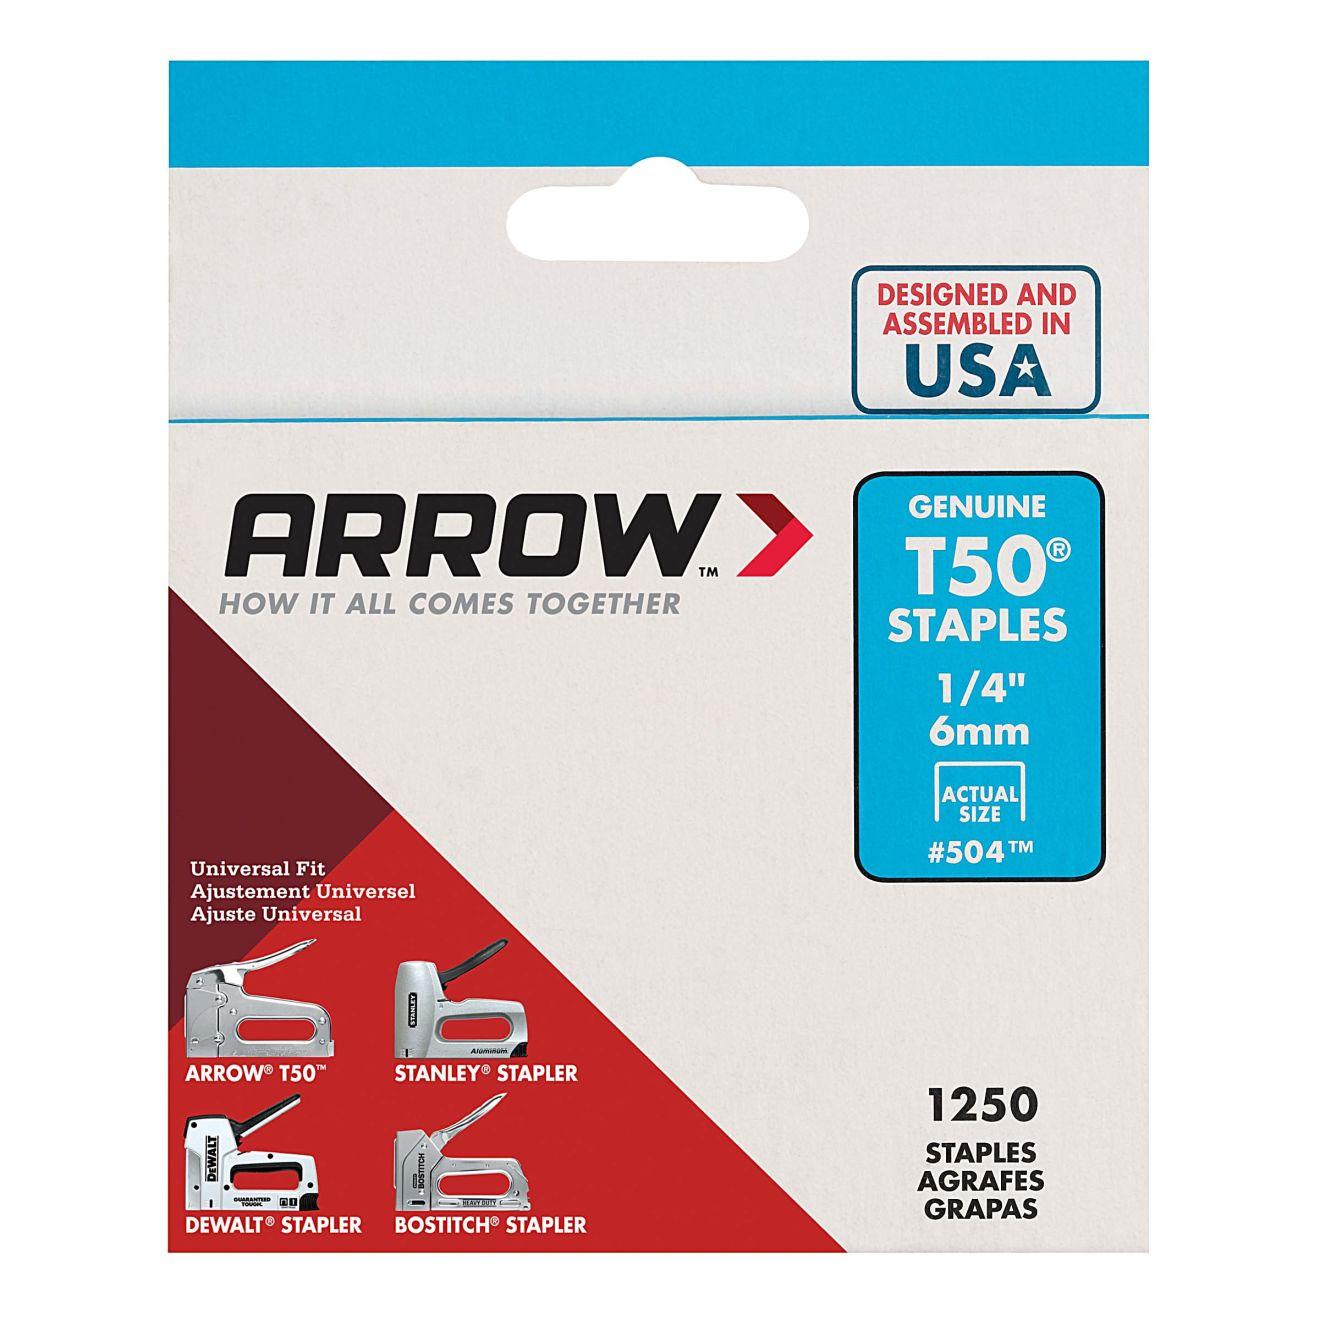 Arrow T50 1/4 in. Staples (1250-Pack)